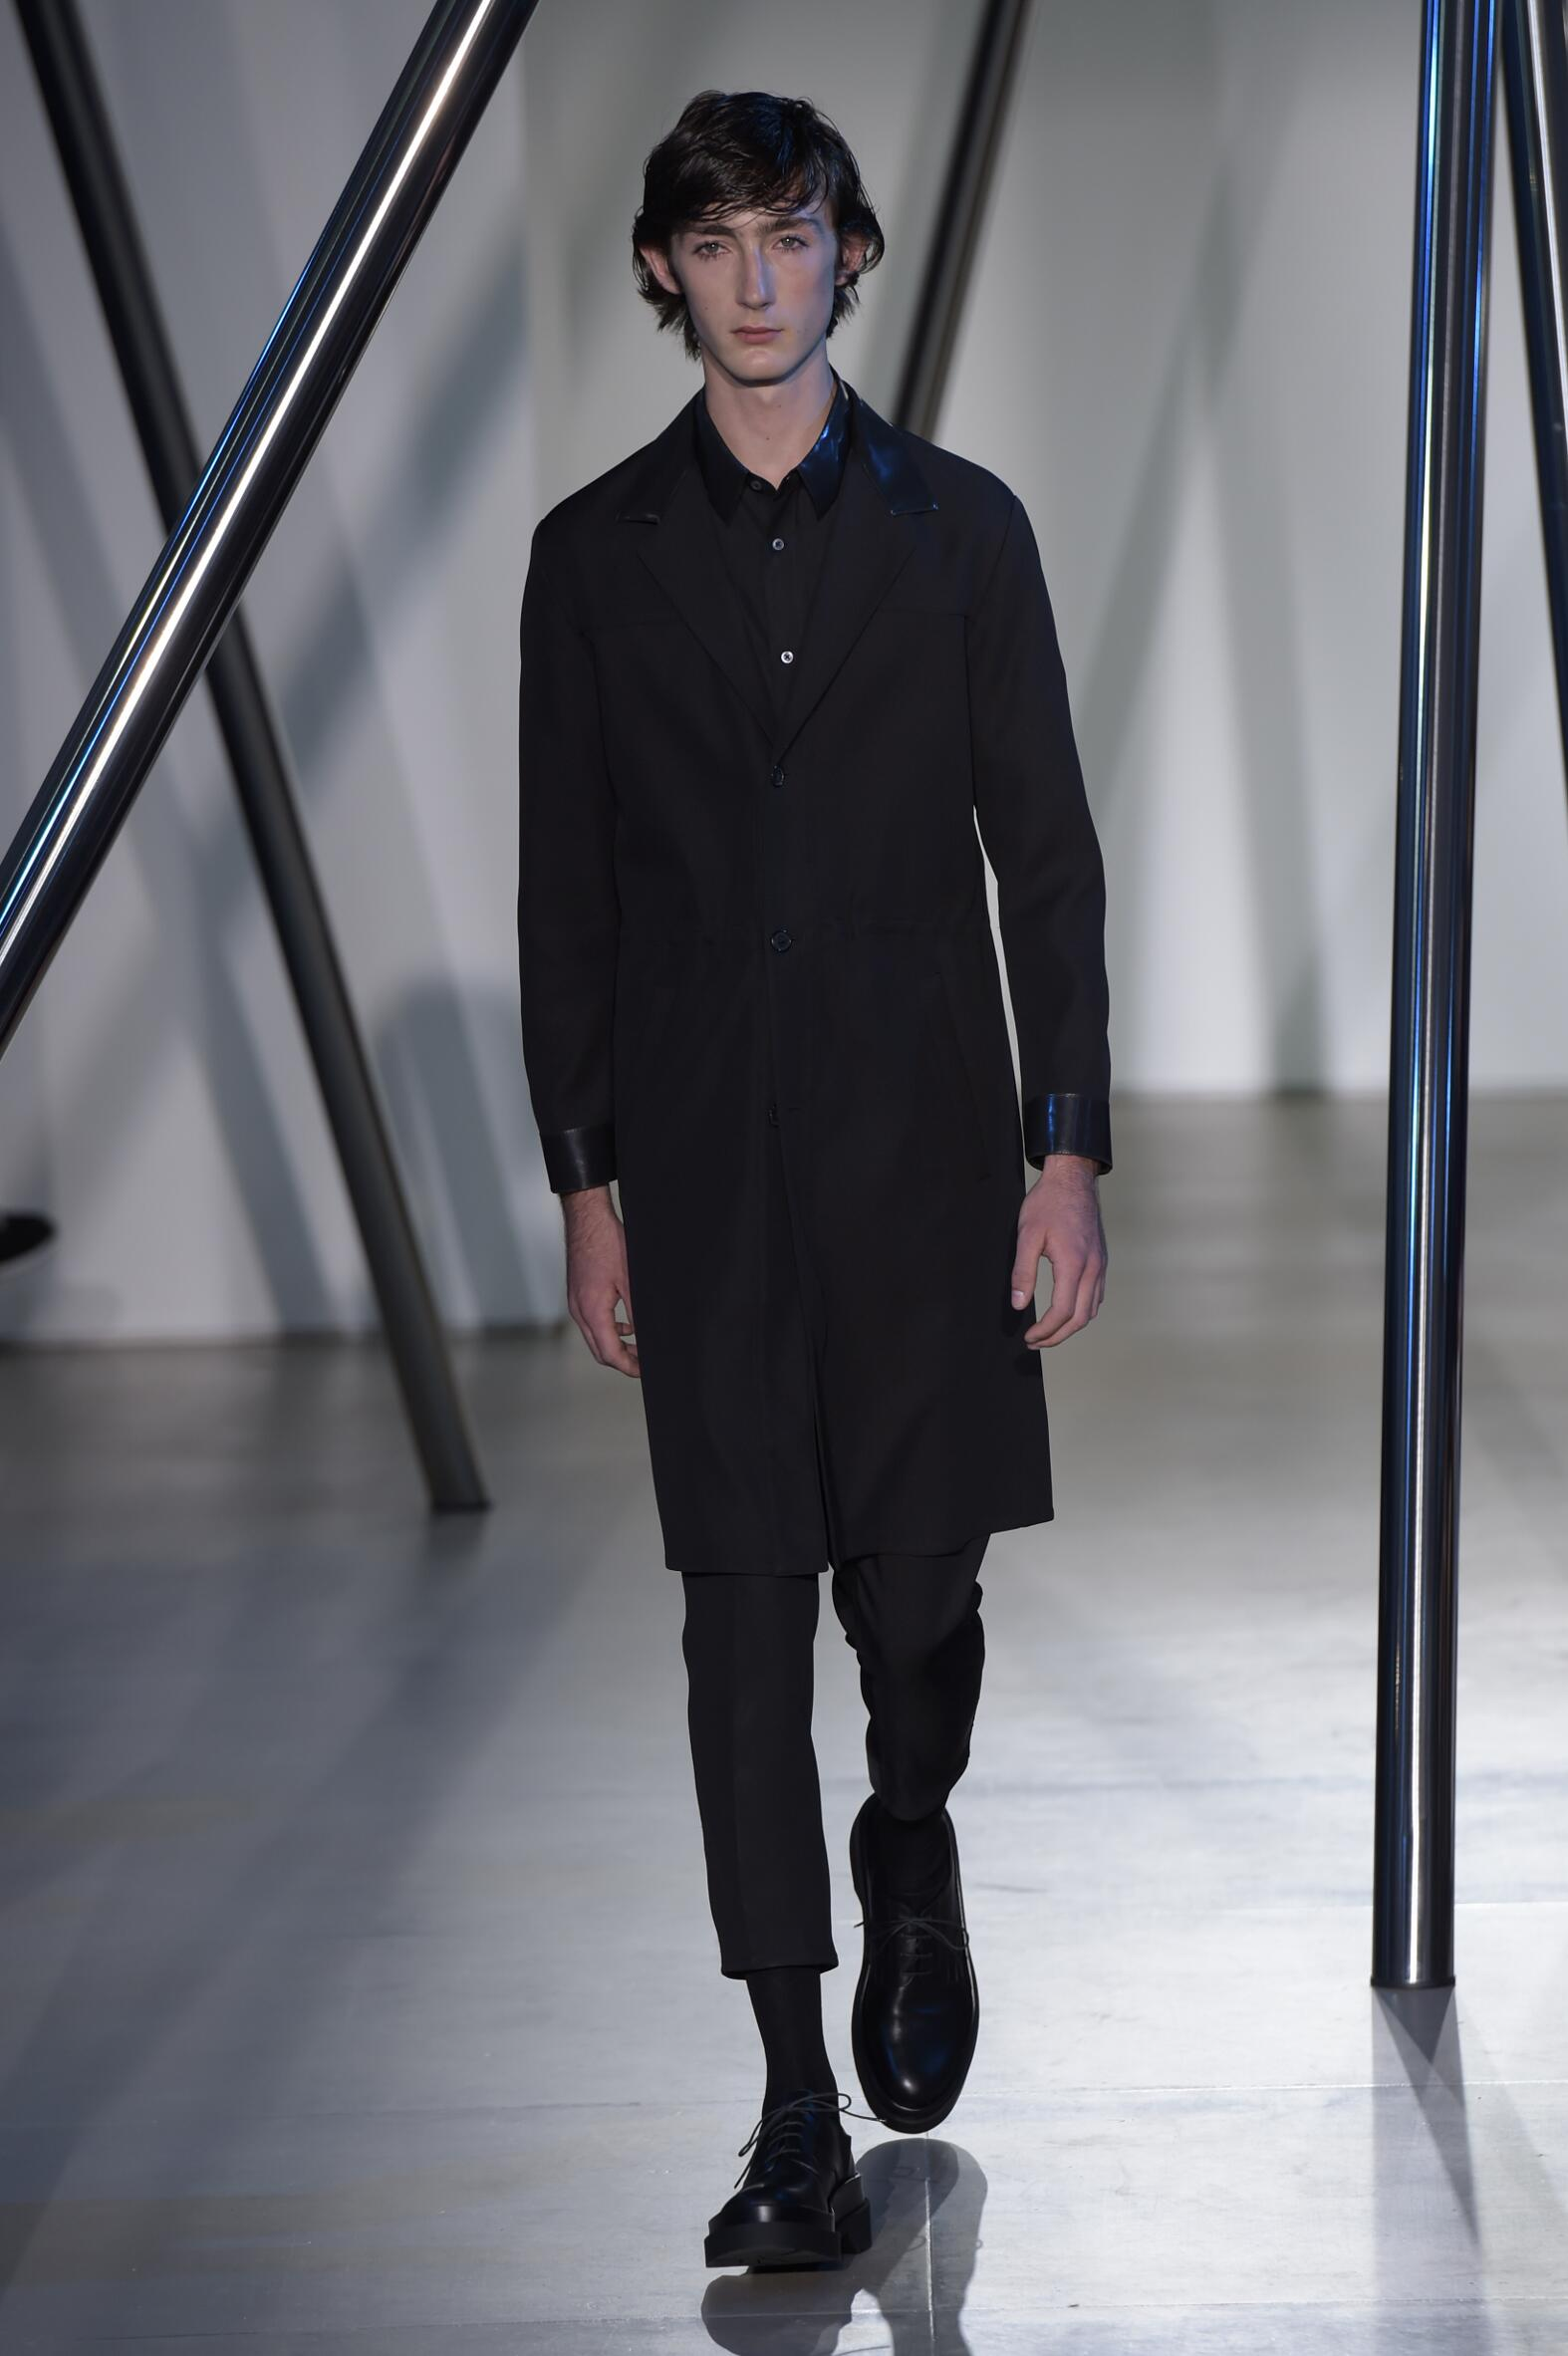 Summer 2016 Fashion Trends Jil Sander Collection